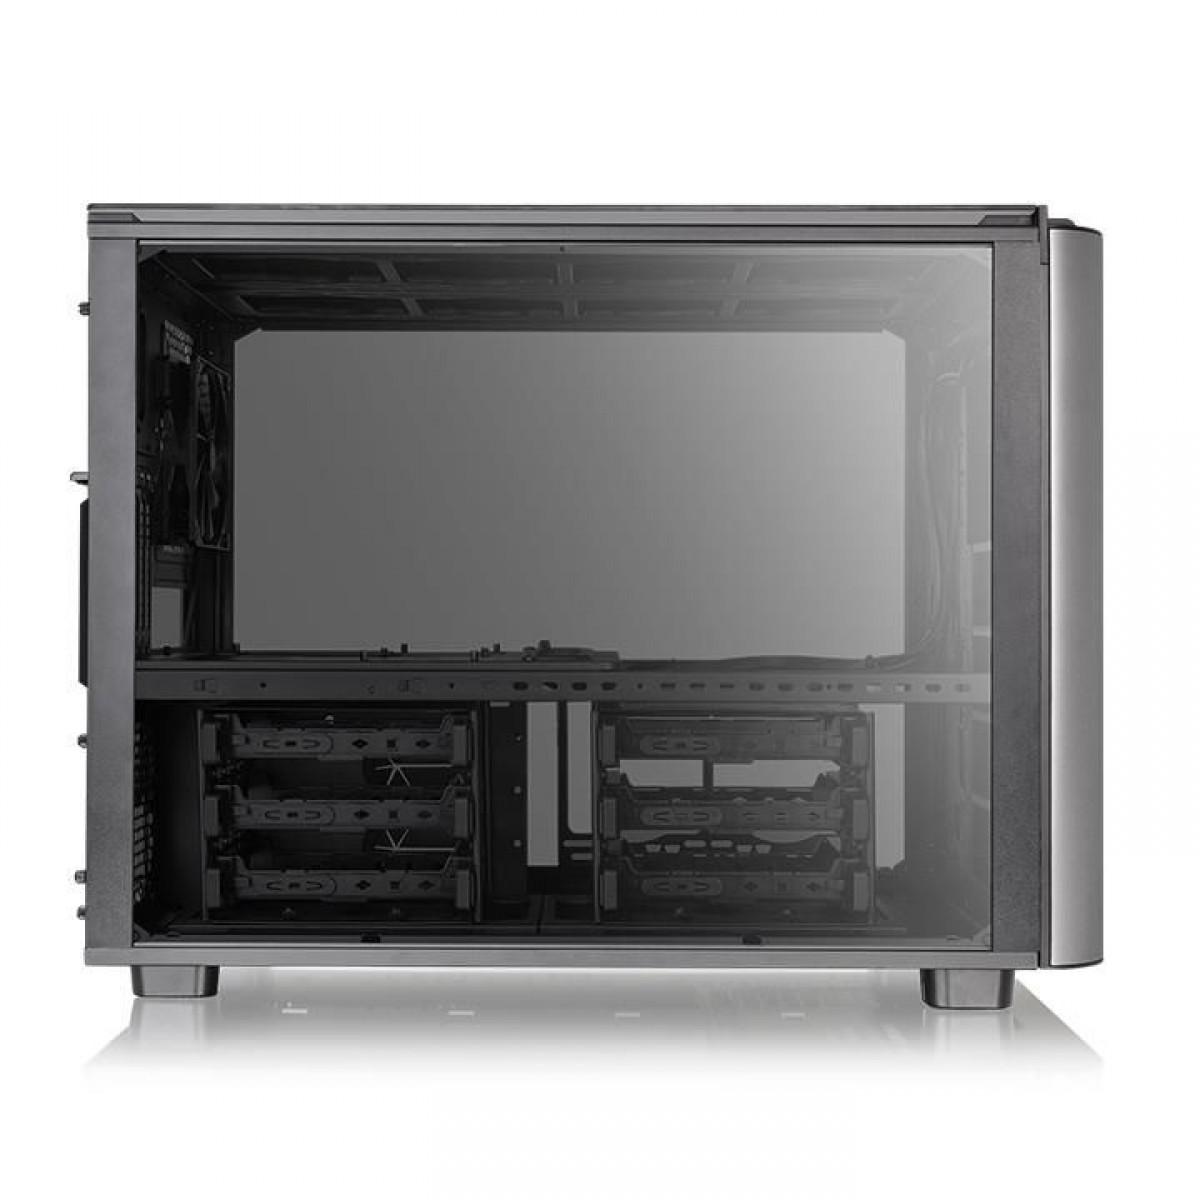 Gabinete Gamer Thermaltake Level 20 XT, E-ATX Cube Case, 4 Vidros Temperados, Black, Com 1 Fan, Sem Fonte, CA-1L1-00F1WN-00